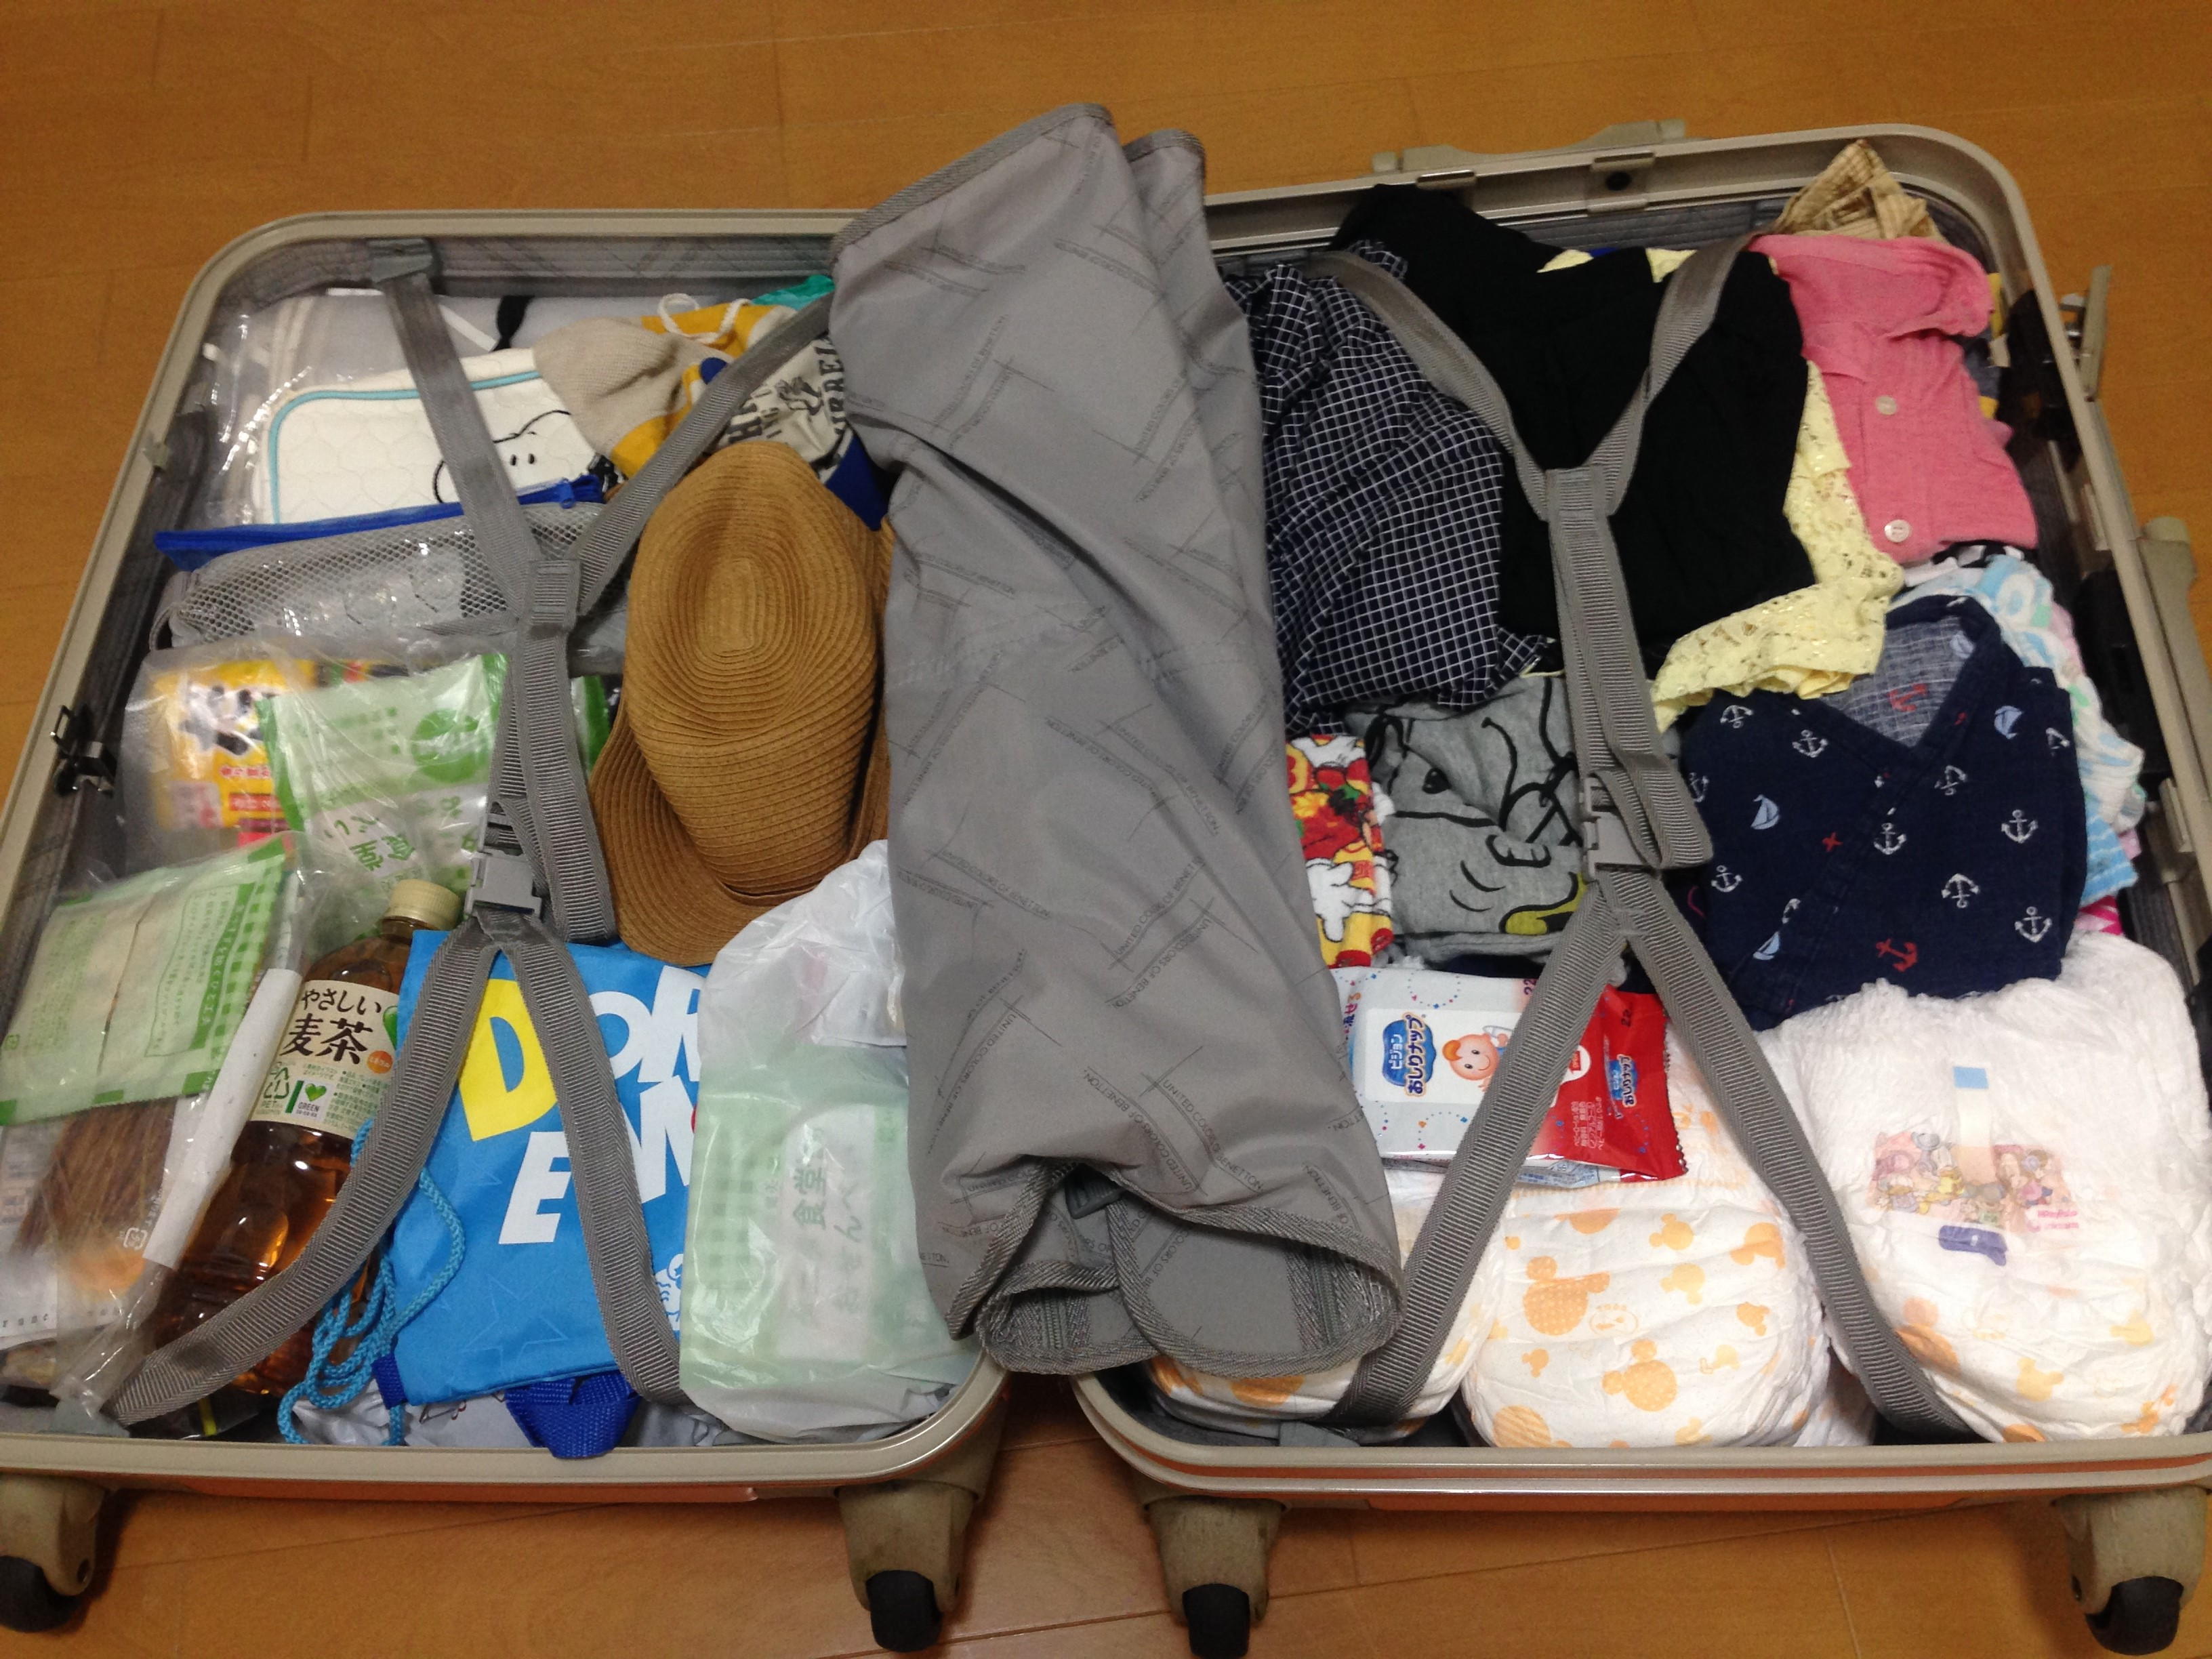 425a9a6e1d カナダ旅行記【準備編】母子旅行、荷物の中身全部見せます! | あんふぁんWeb